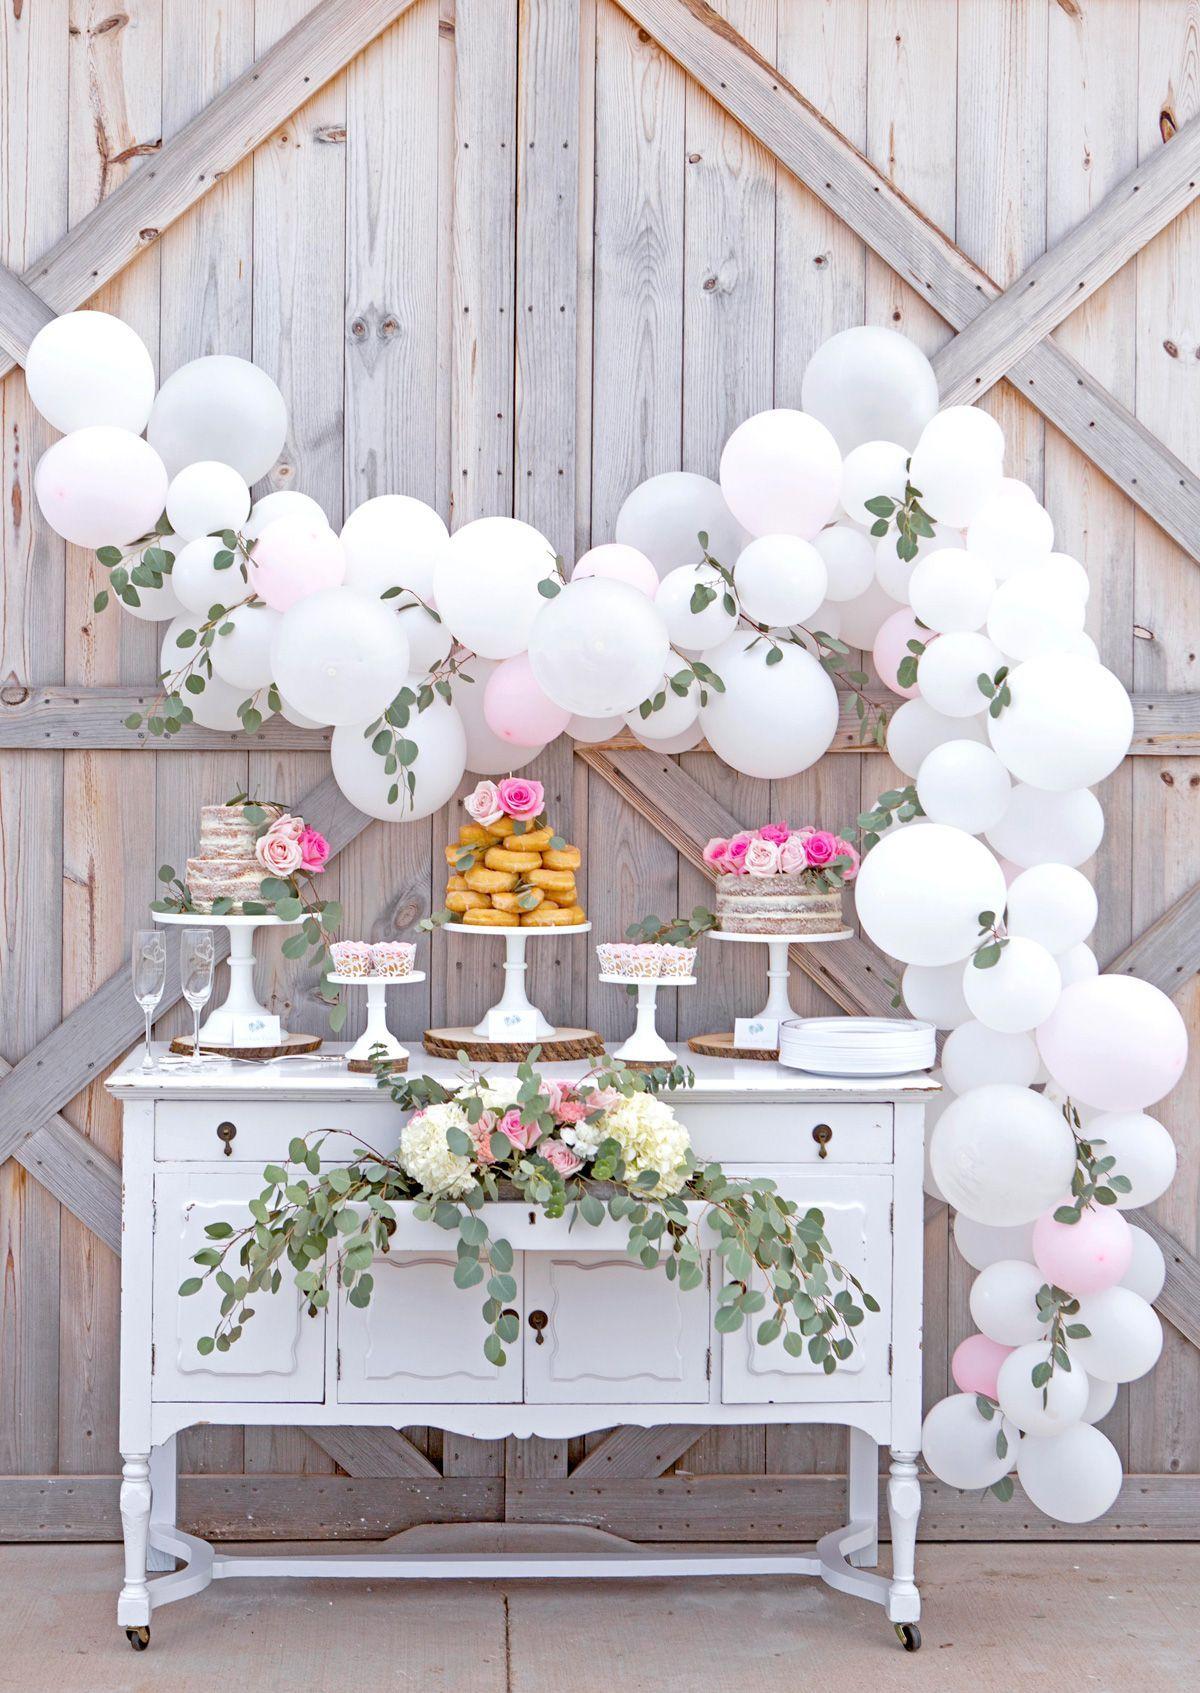 Gorgeous Rustic Barn wedding cake table with easy diy balloon ...